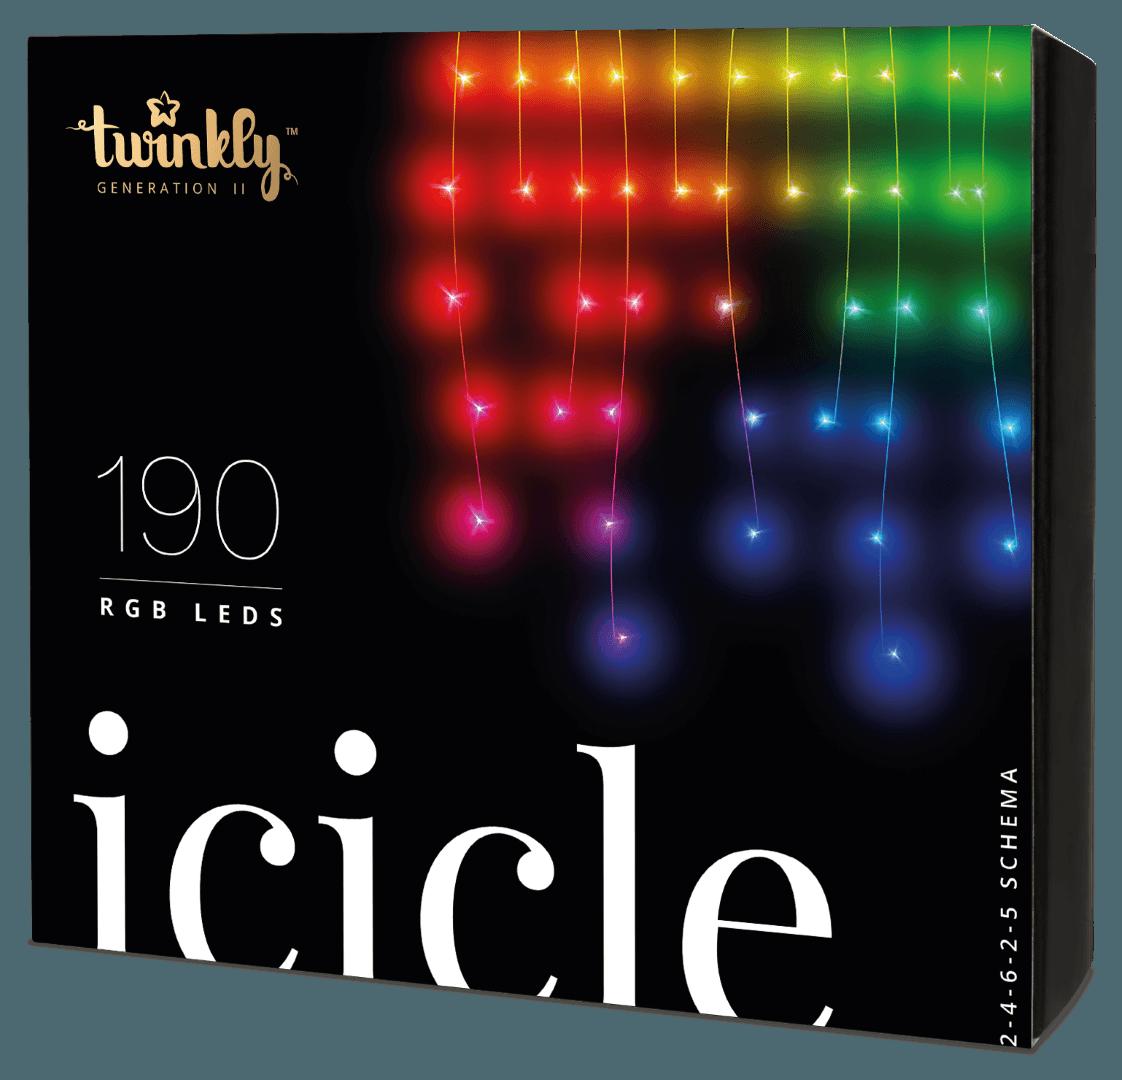 Twinkly 190 RGB LEDs Icicle Lights - Generation II